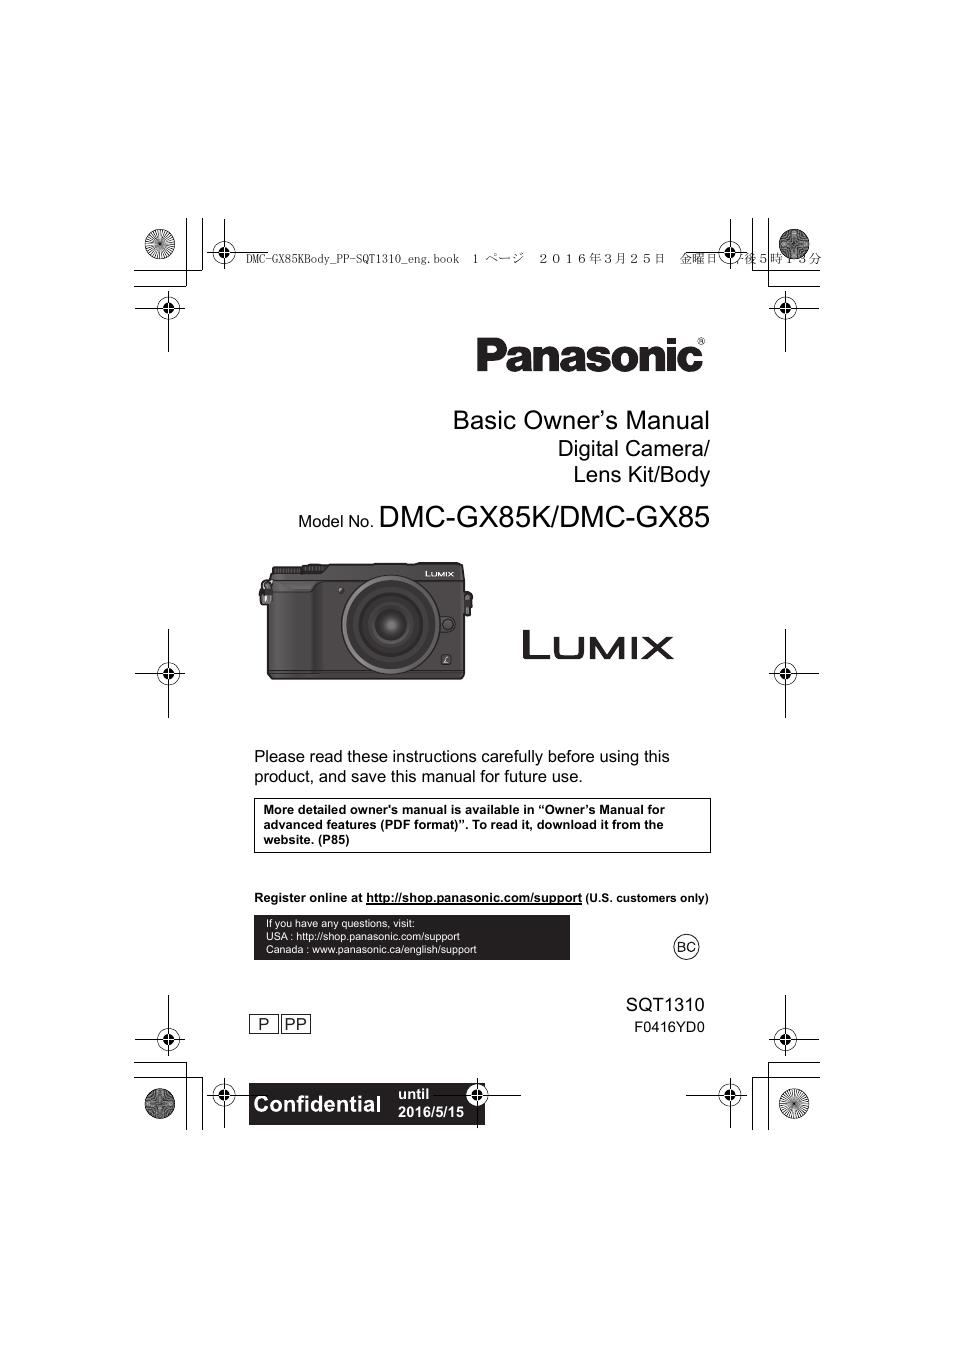 panasonic lumix gx80 user manual 92 pages rh manualsdir com panasonic support manuals model kx-tgf372 panasonic support manuals model kx-tgf372